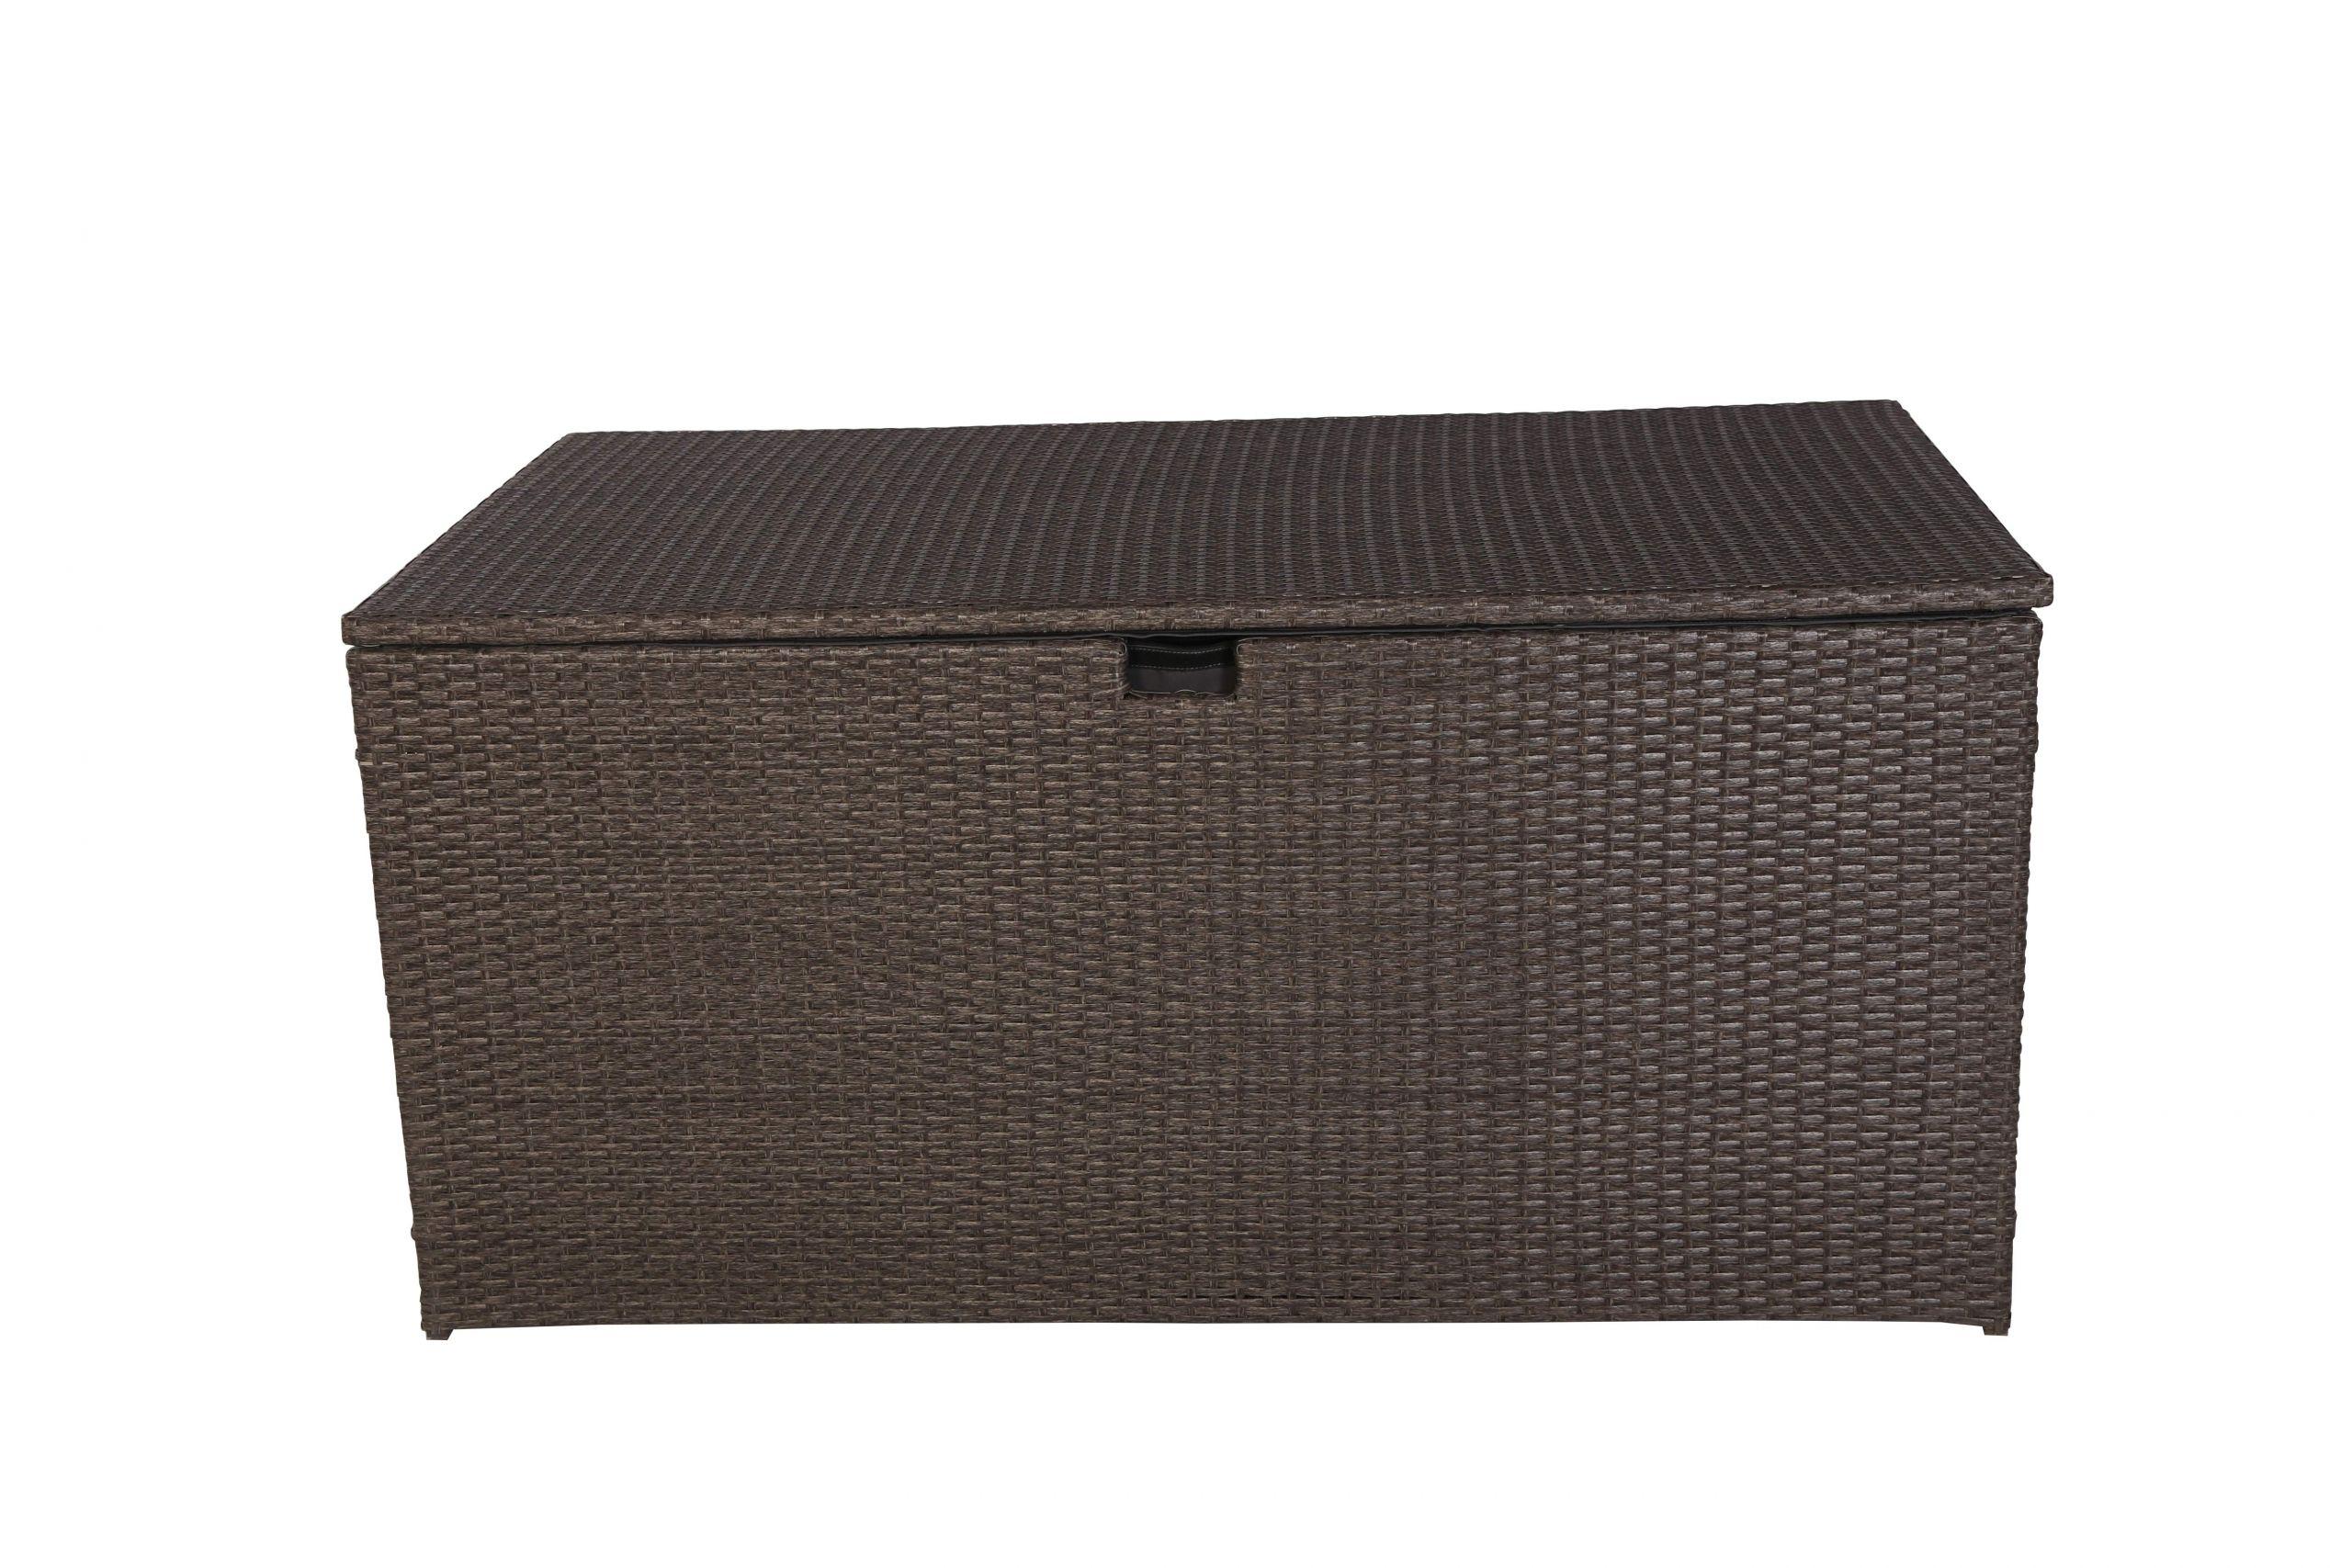 Kissenbox Garten Einzigartig Milos Polyrattan Auflagenbox Kissenbox Braun 145x80x60cm